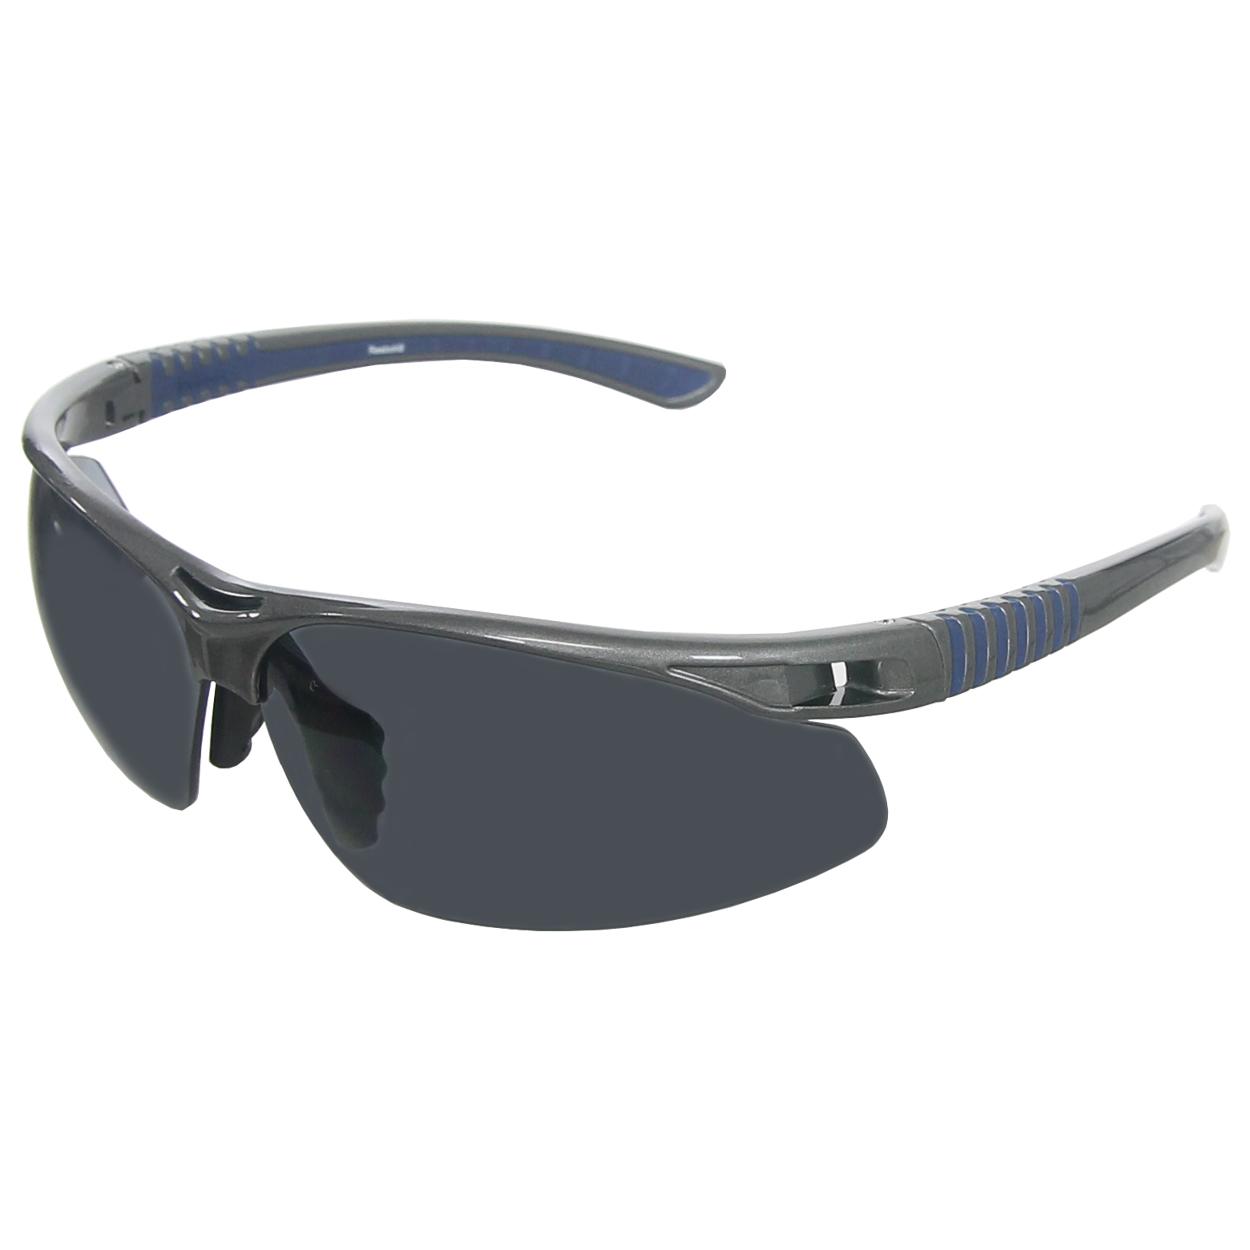 Reebok Golf ZigPro Sunglasses REEBOK-ZIGPRO-SUNGLASSES